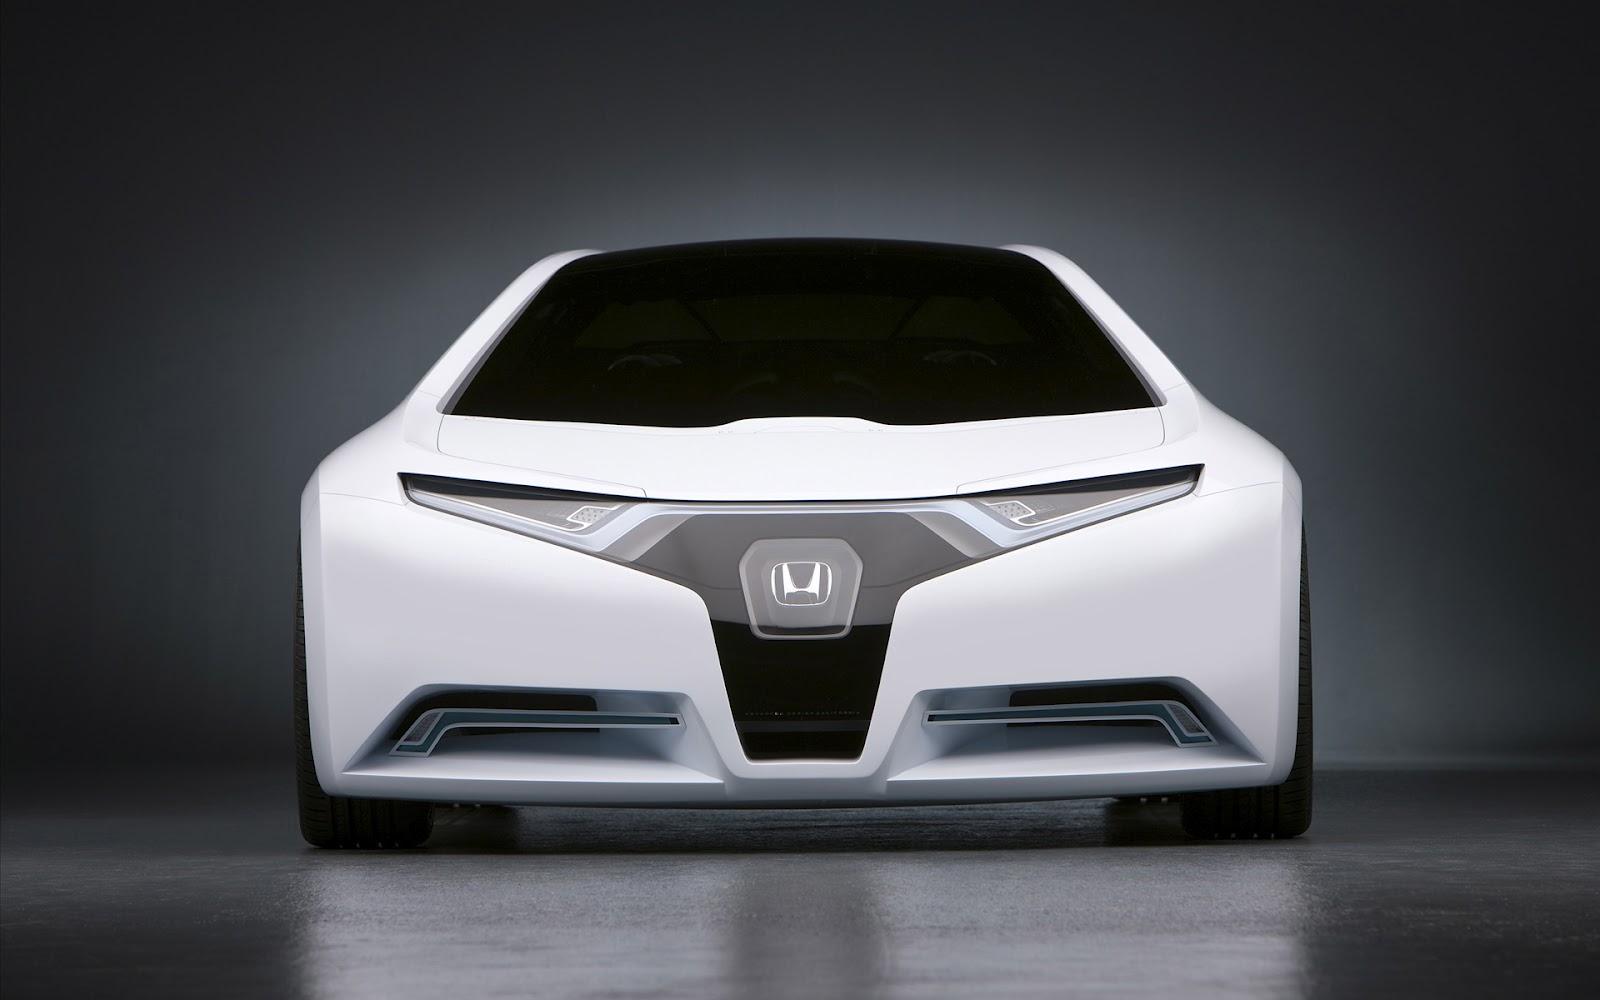 http://4.bp.blogspot.com/-Qfh_RLa03So/T2z4PS0MBWI/AAAAAAAAA90/aFTdMiLJ0a4/s1600/Honda_FC_Sport_White_Car_Front_View_HD_Wallpaper.jpg